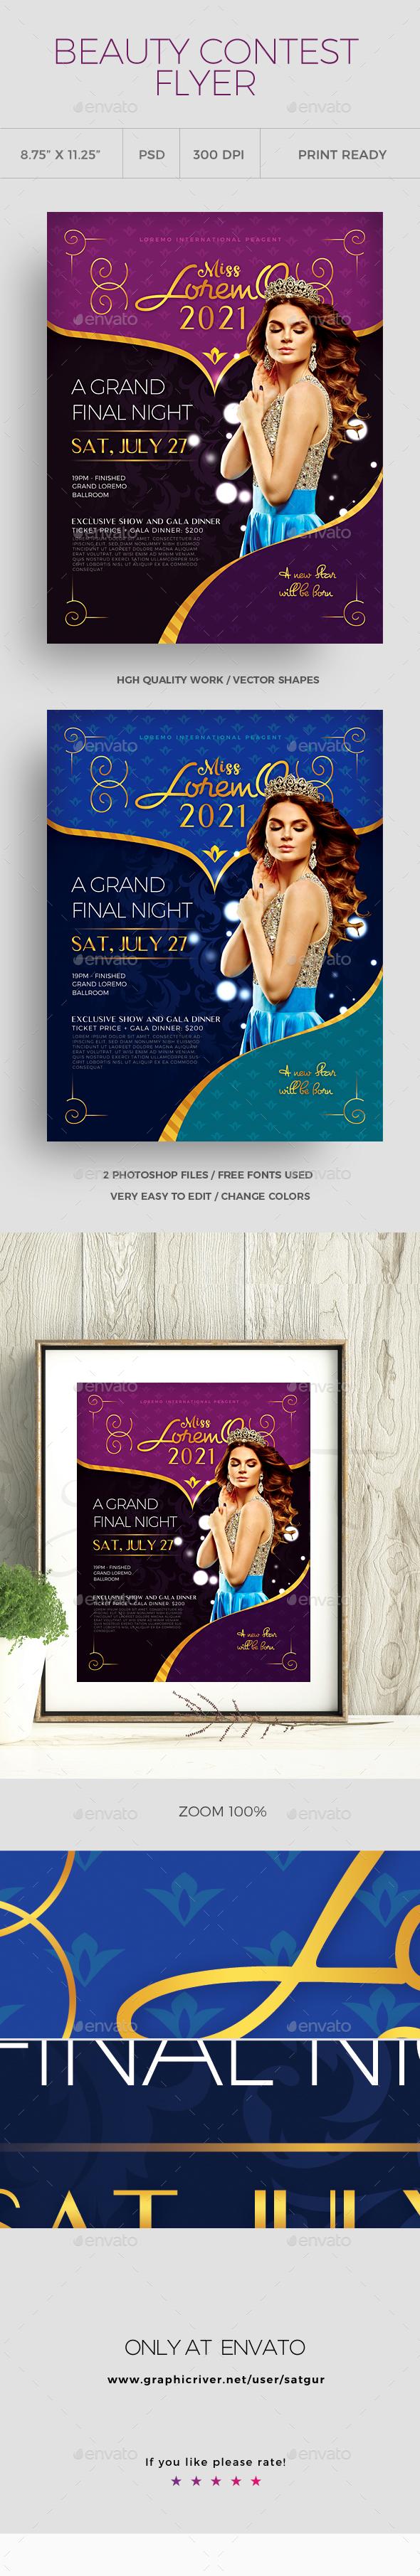 GraphicRiver Beauty Contest Flyer vol1 21006203